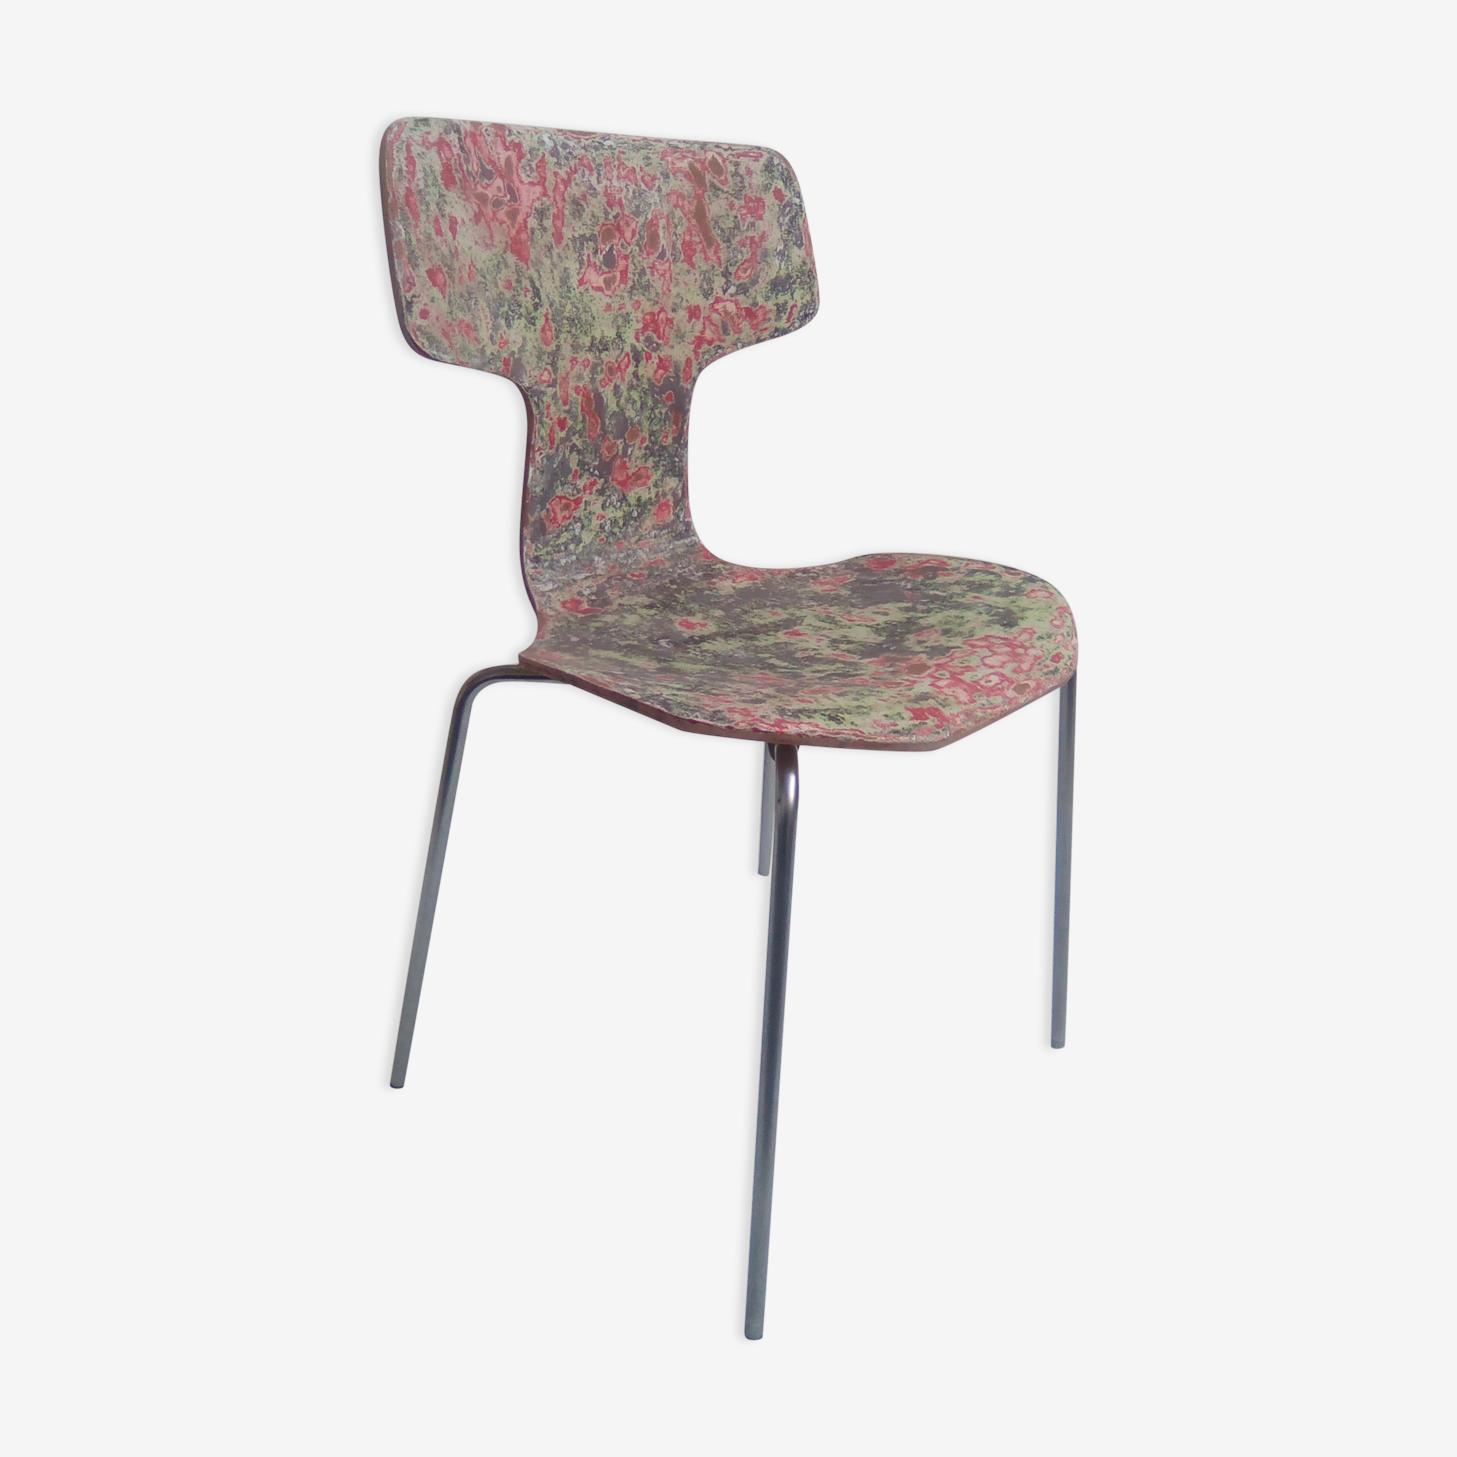 Chaise hammer de Arne Jacobsen